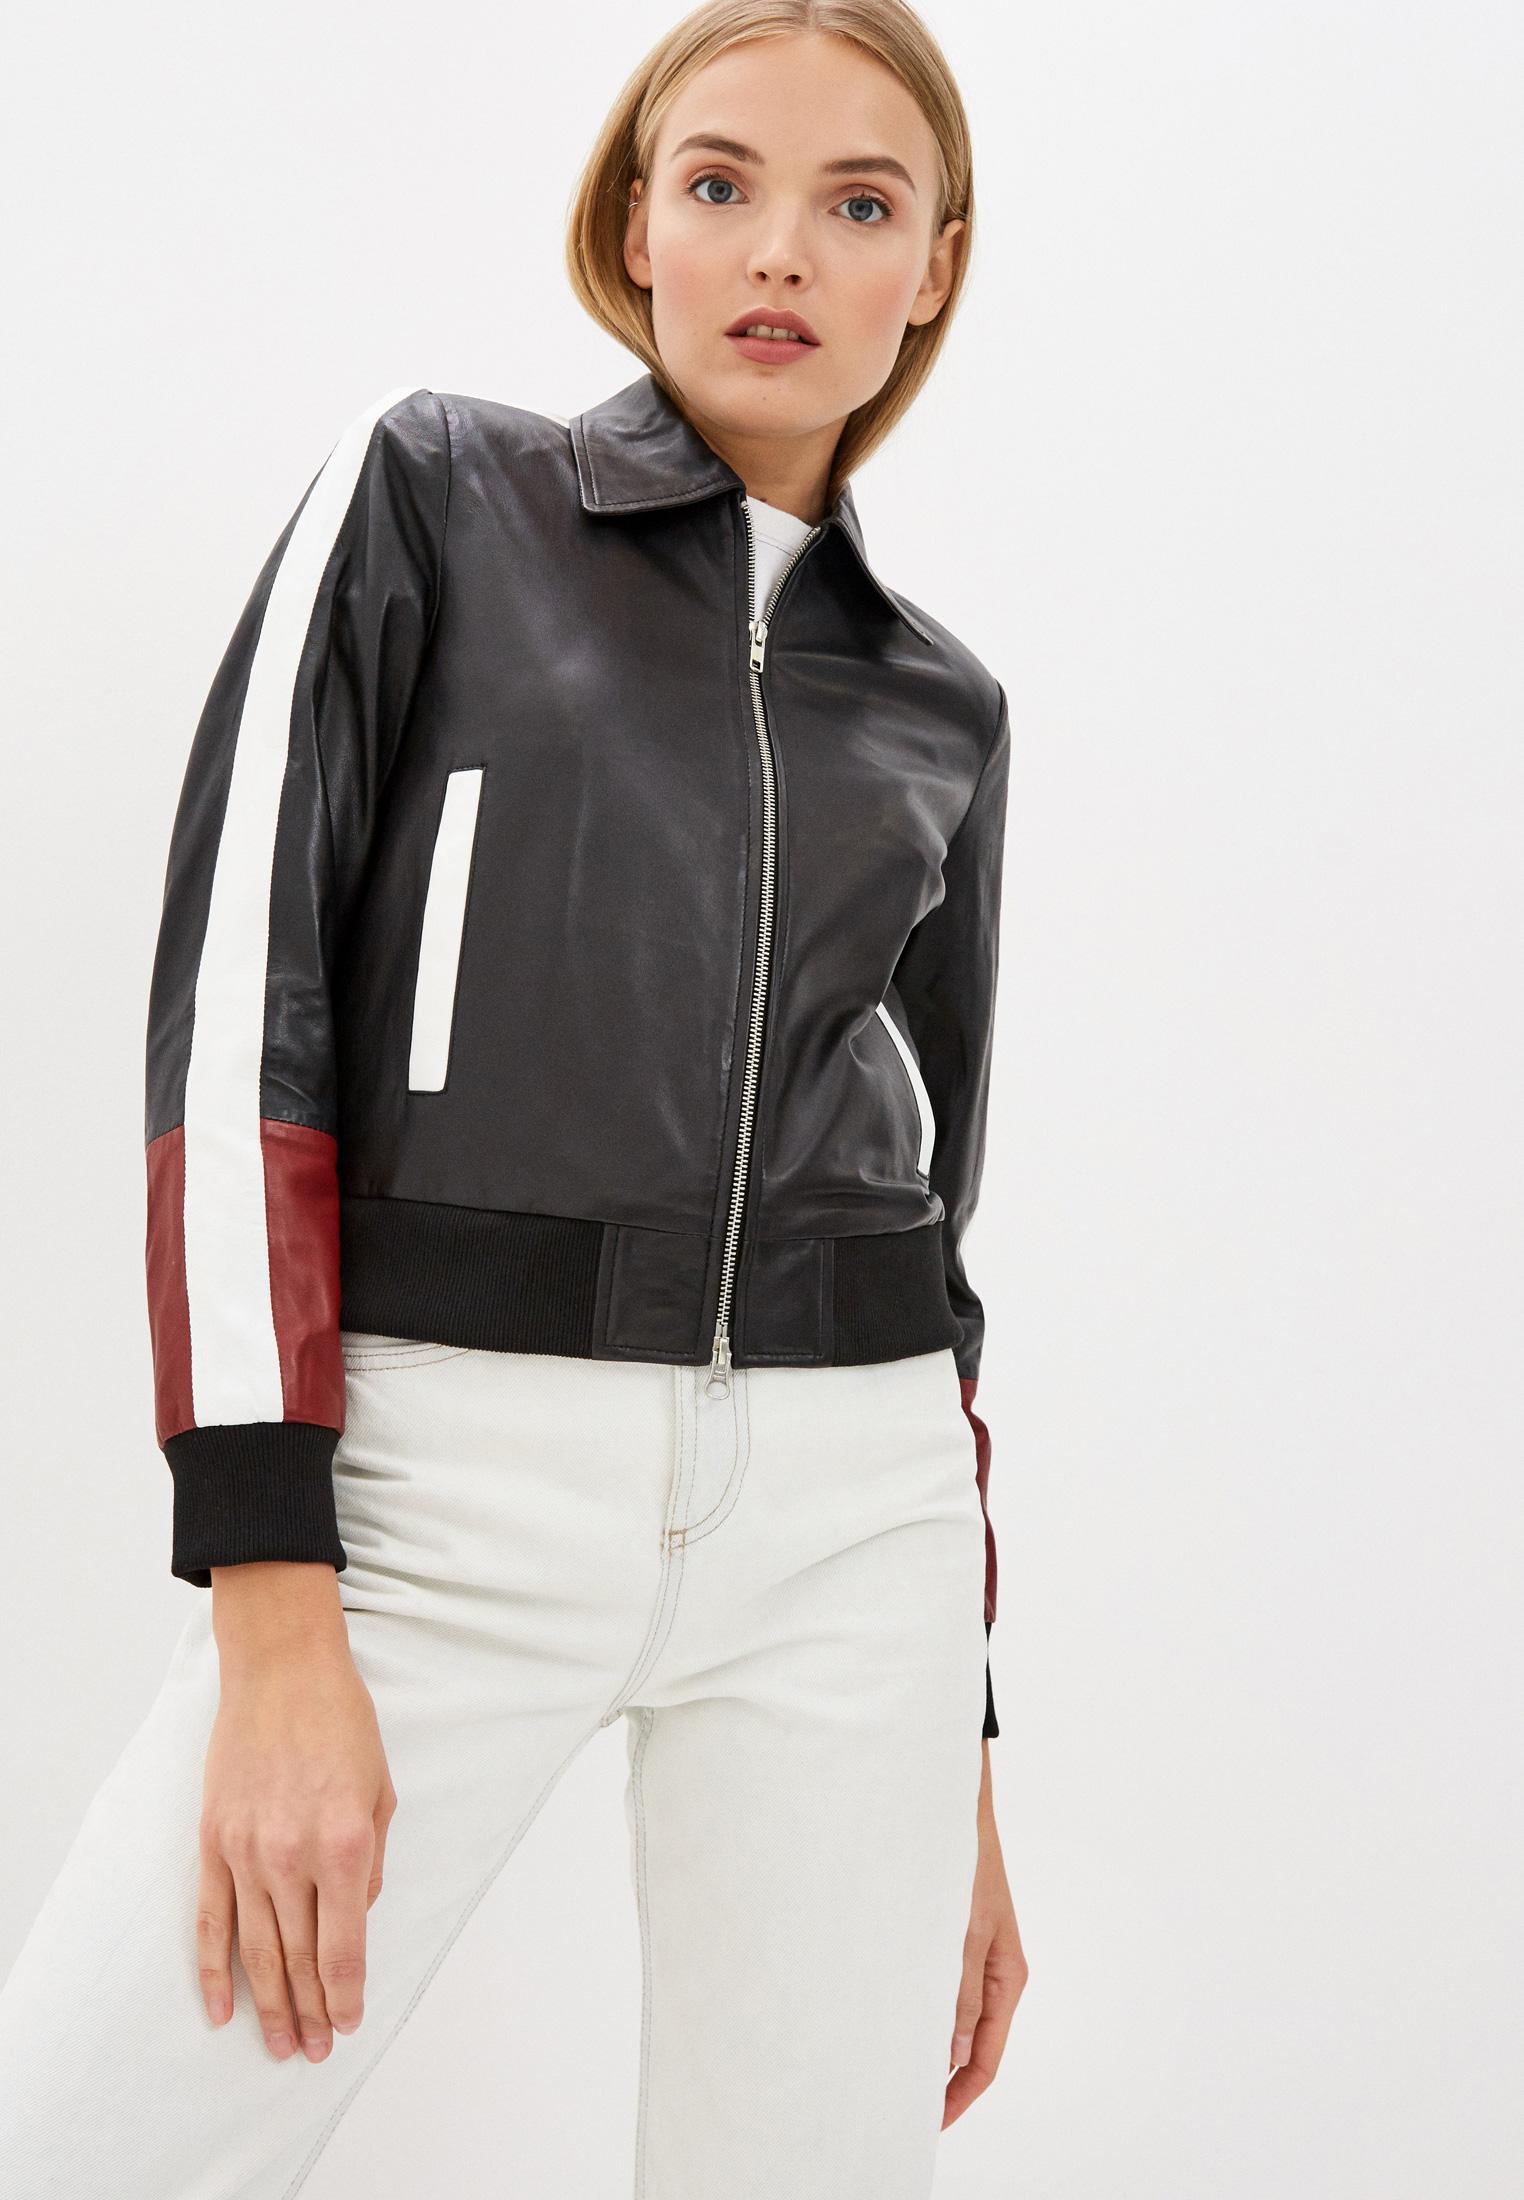 Кожаная куртка Serge Pariente STREET GIRL OVER SIZE